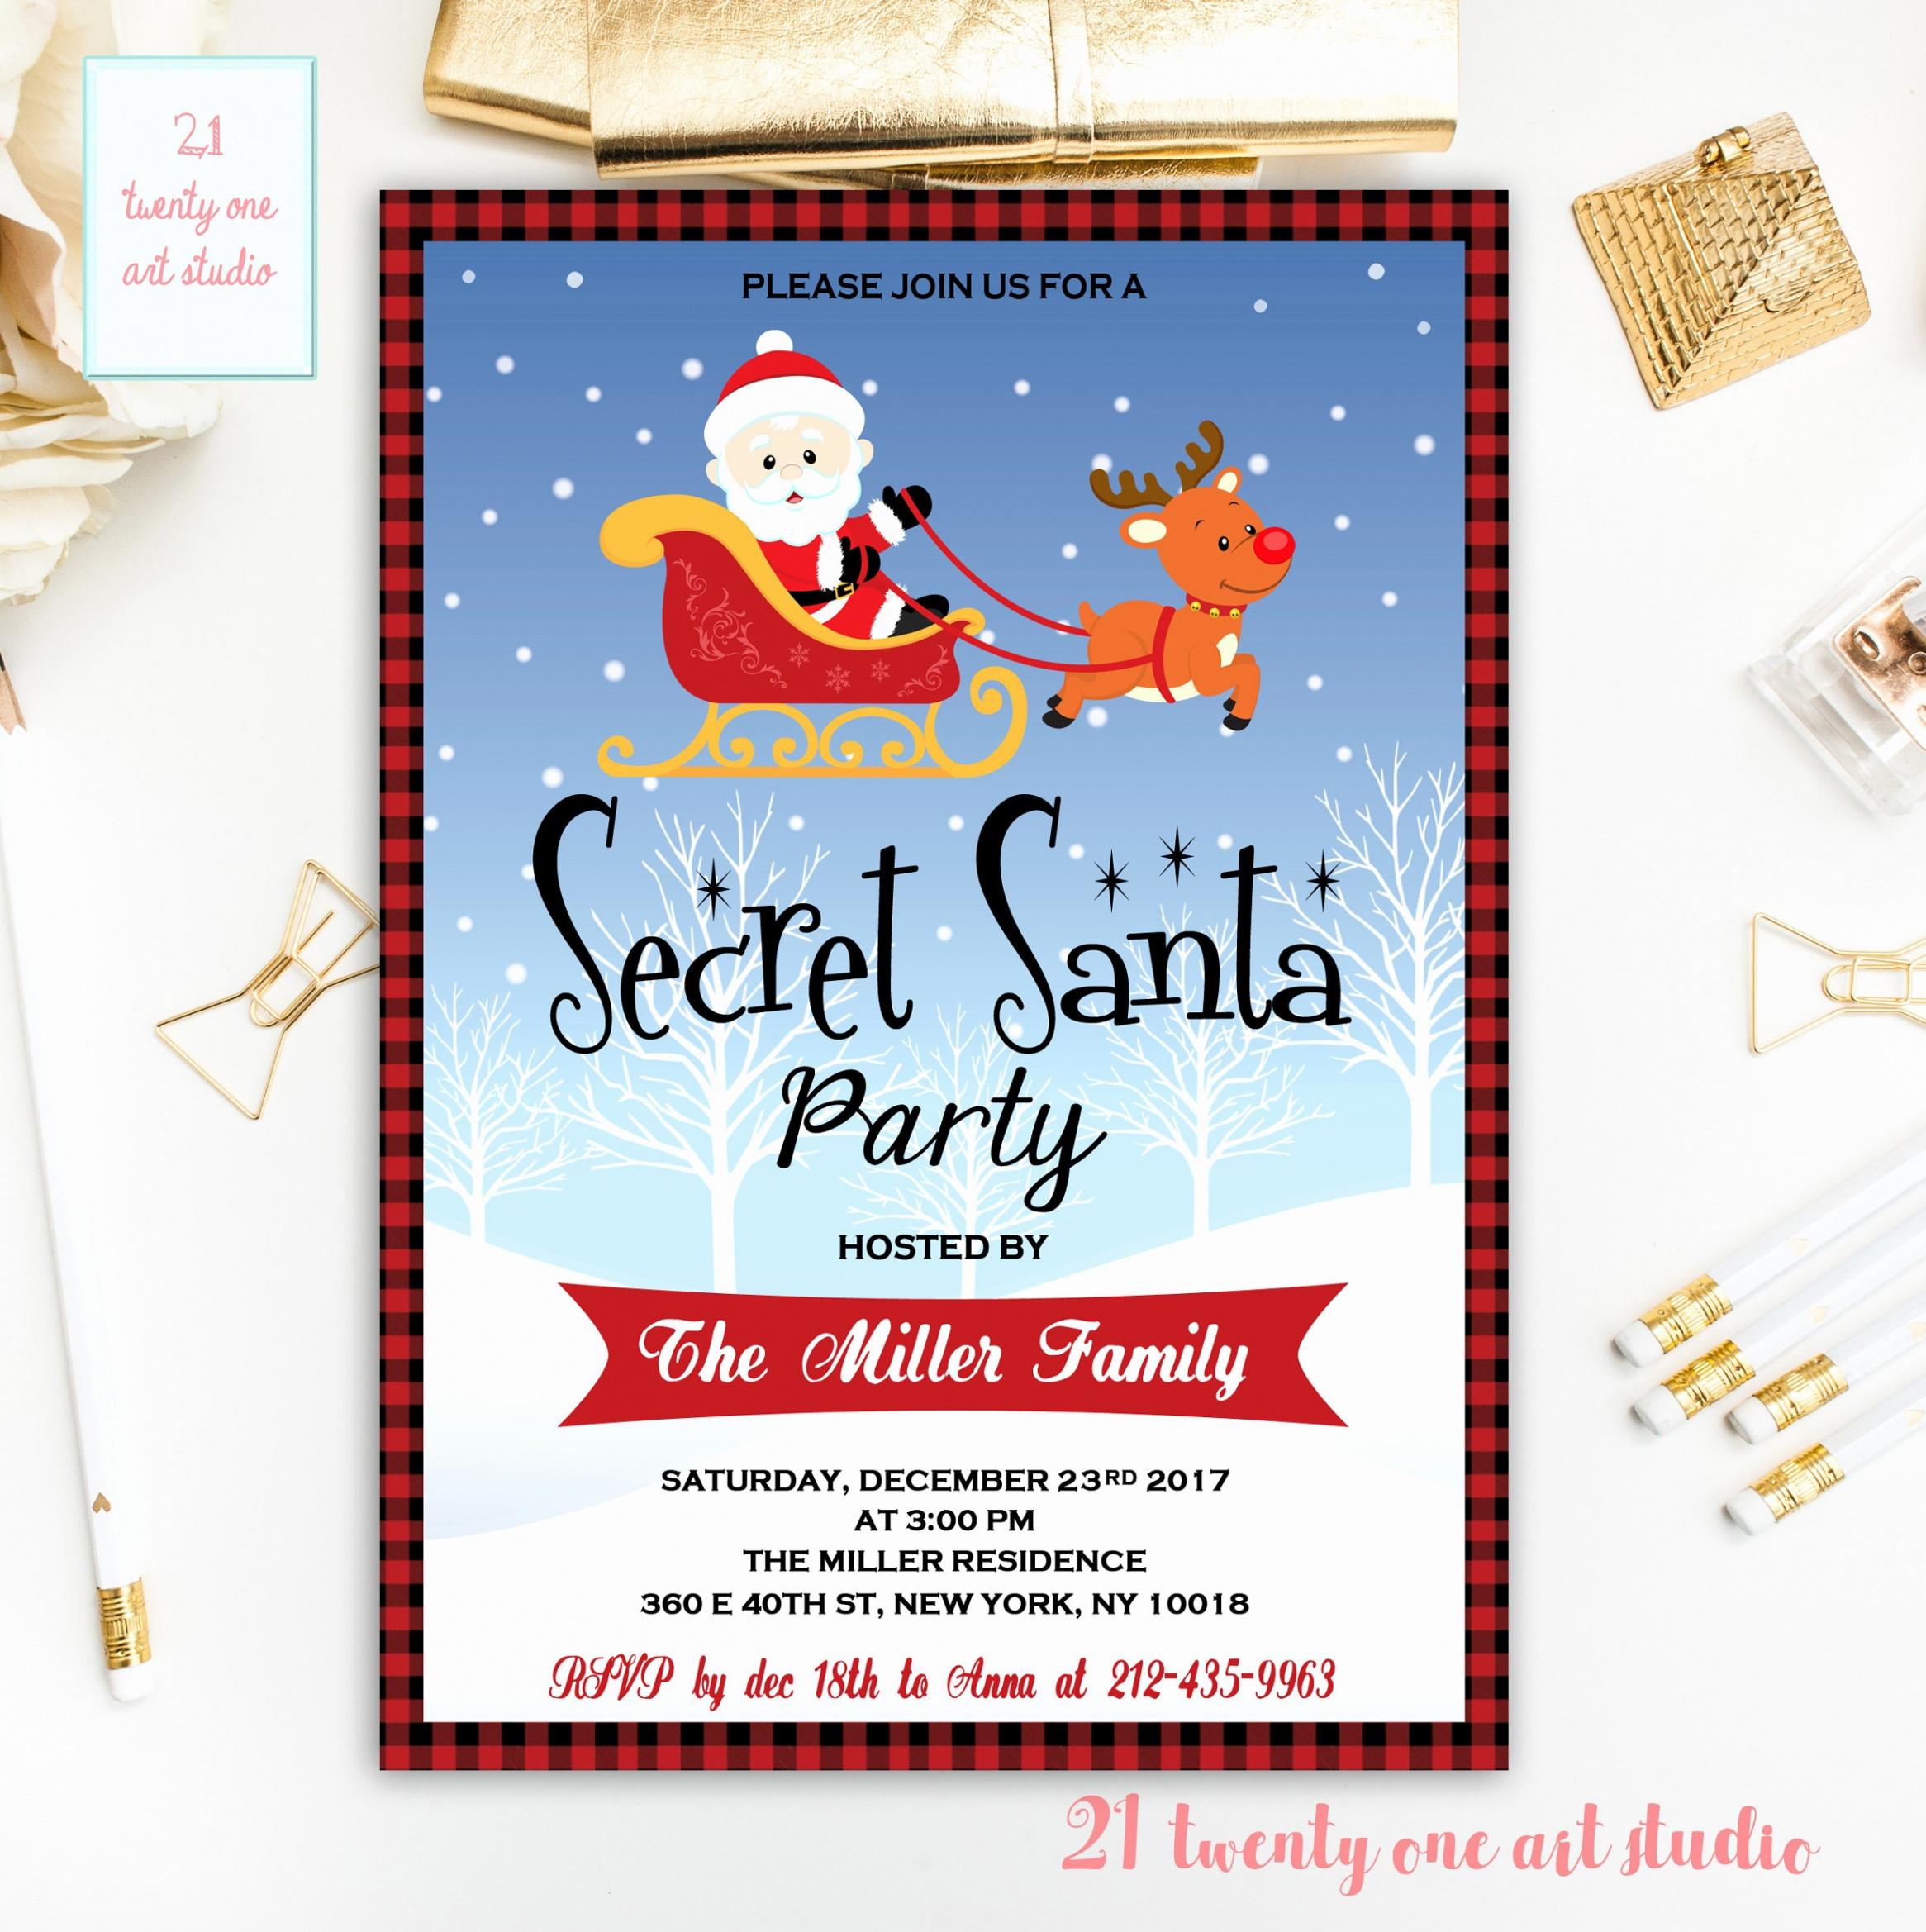 Fresh Free Printable Polka Dot Birthday Party Invitations - Free Printable Polka Dot Birthday Party Invitations